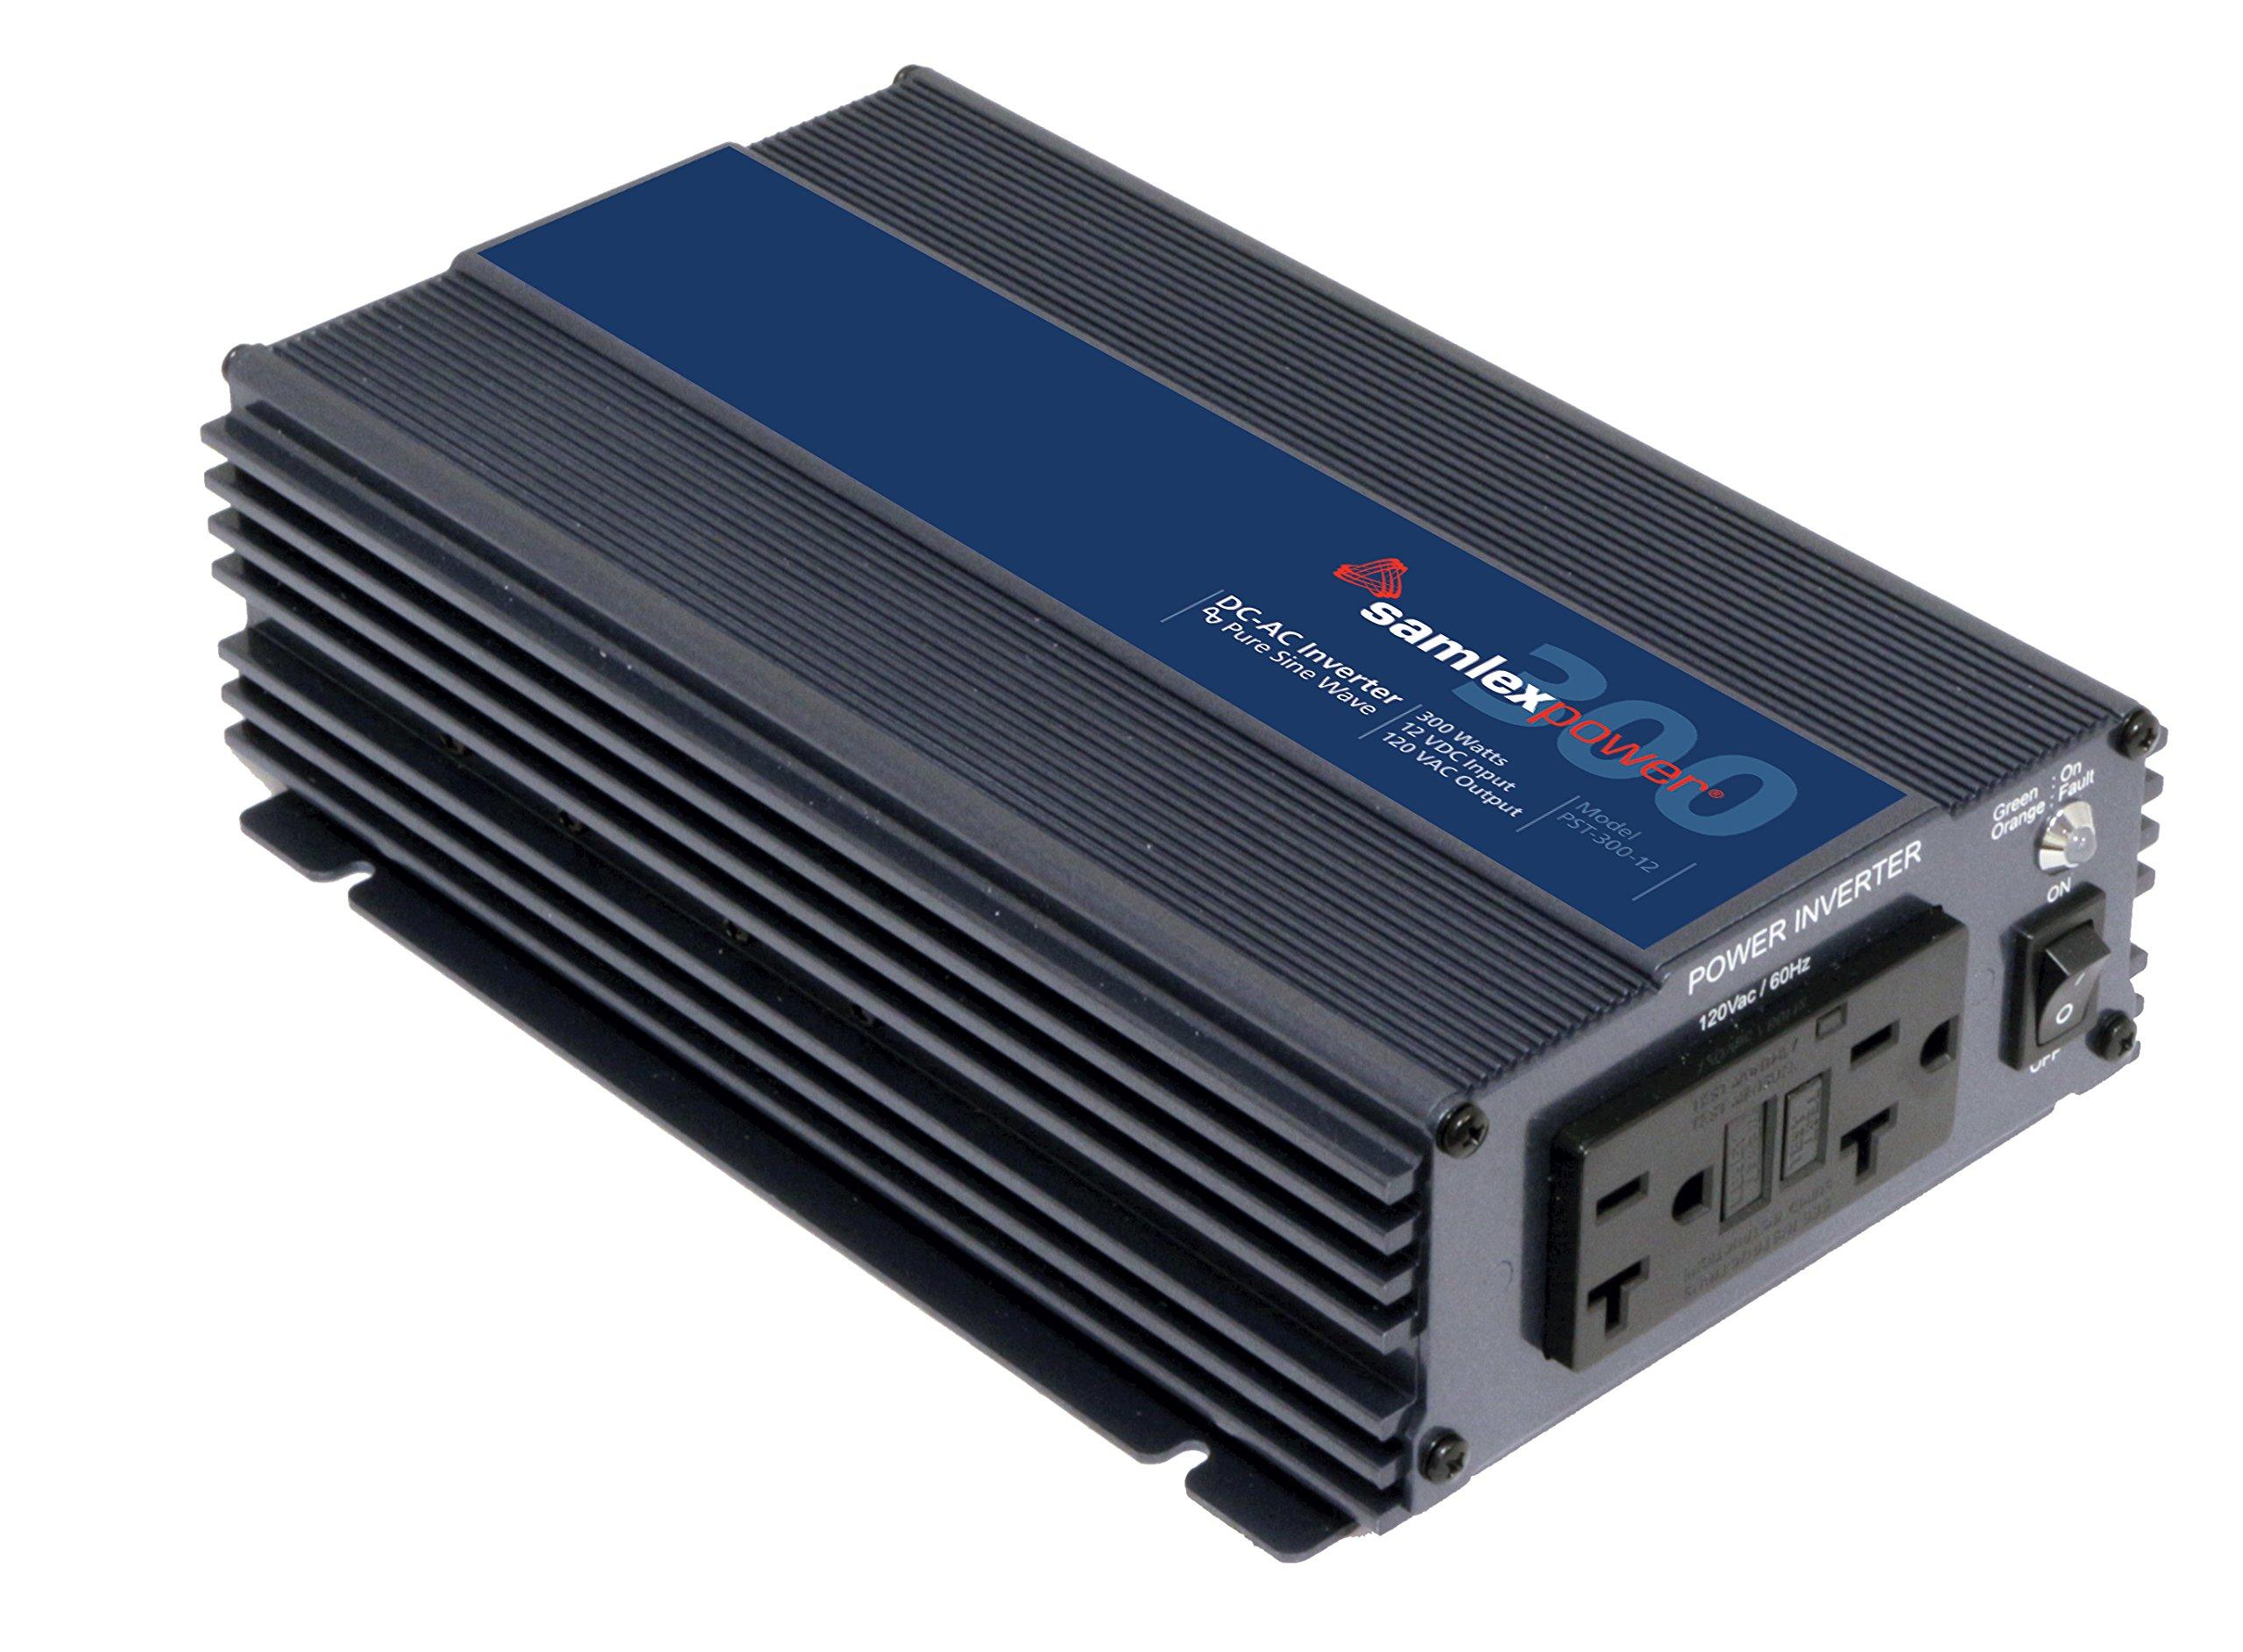 Samlex Pure Sine Wave Inverter..Input: 12 VDC, Output: 120 VAC, 300 Watts..ETL Safety Listed